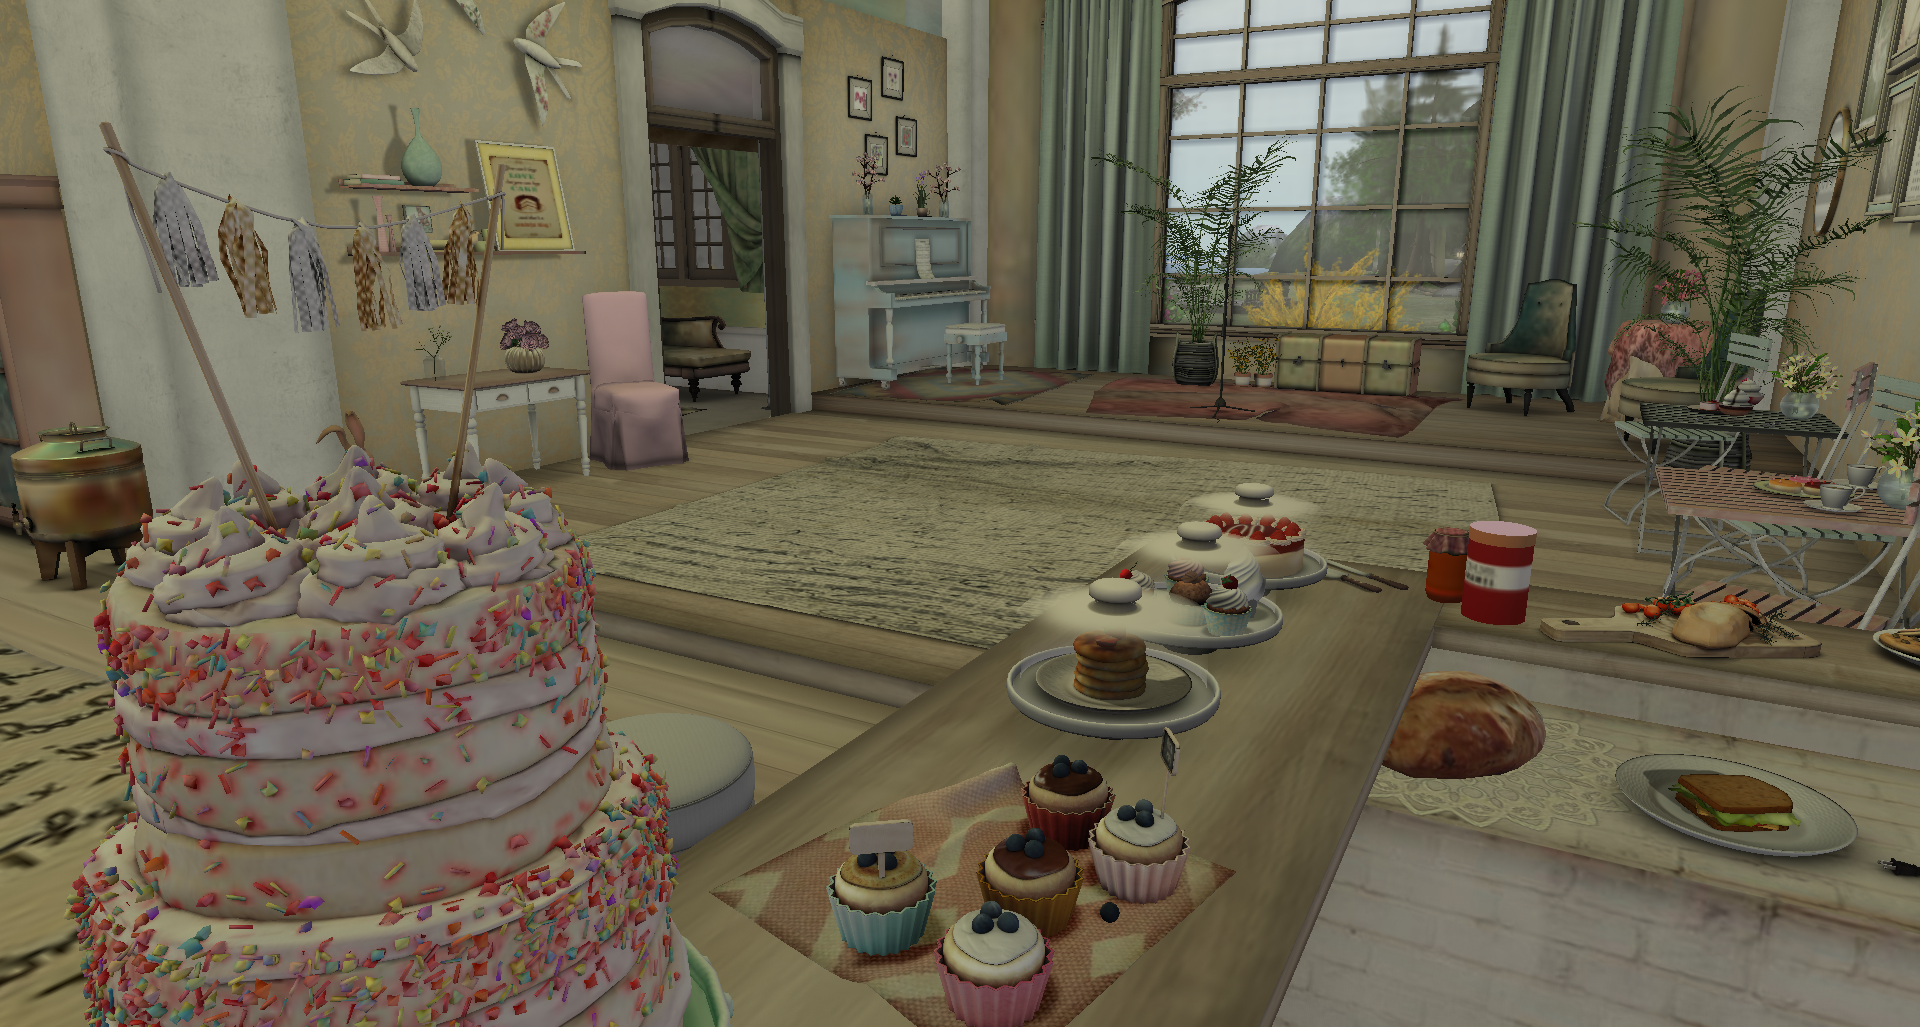 Cafe Gateaux interior 2.png